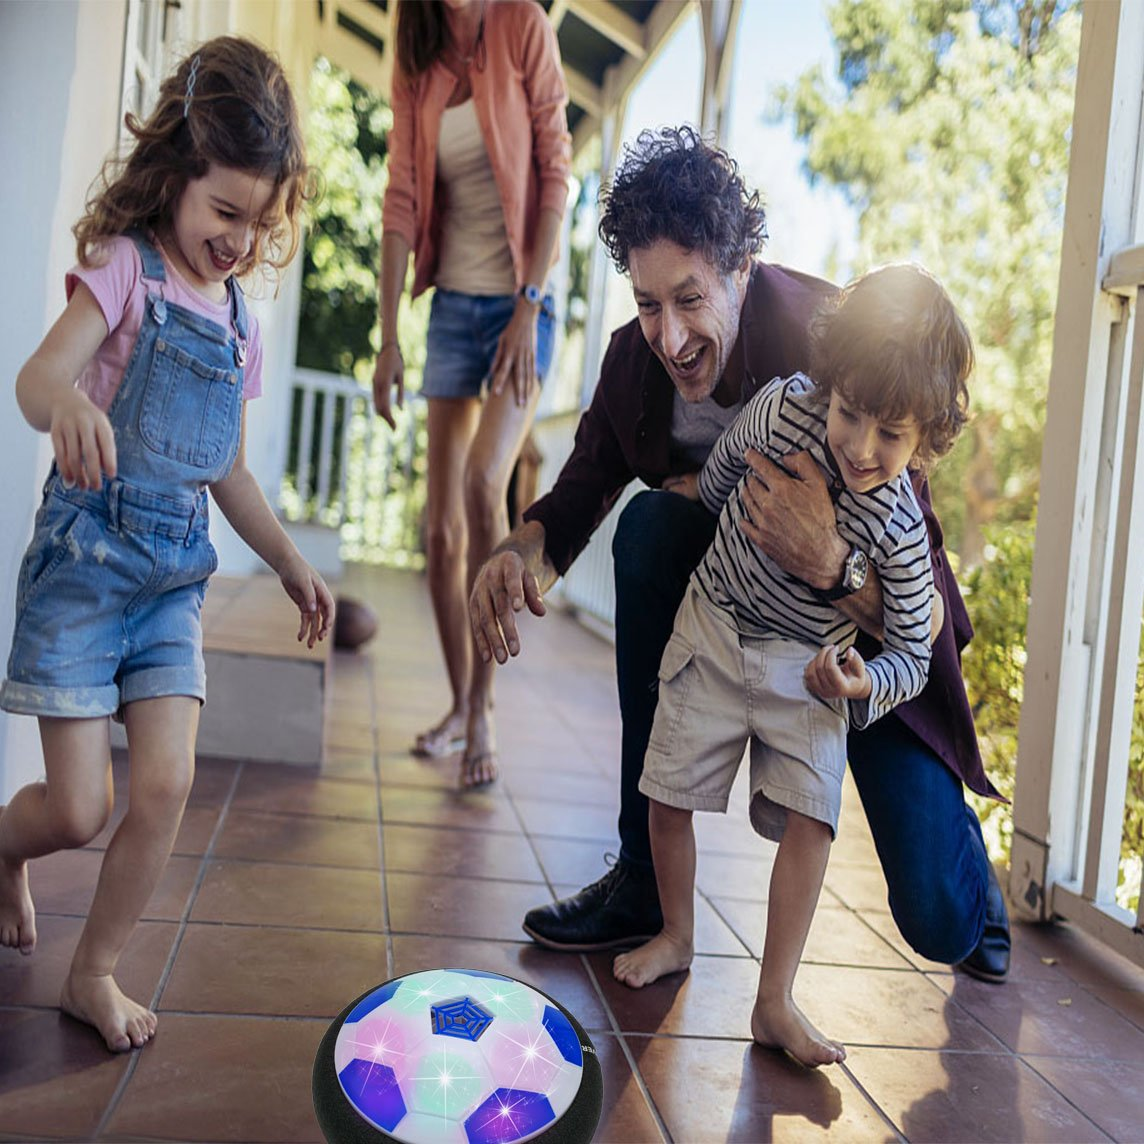 JRD/&BS WINL Bola Interesante De Juguete-LED Bola De Suspensi/ÓN De Aire Deportes De Interior O Al Aire Libre Style1 Red Regalos De Cumplea/ños Para Ni/ños De 4-8 A/ños